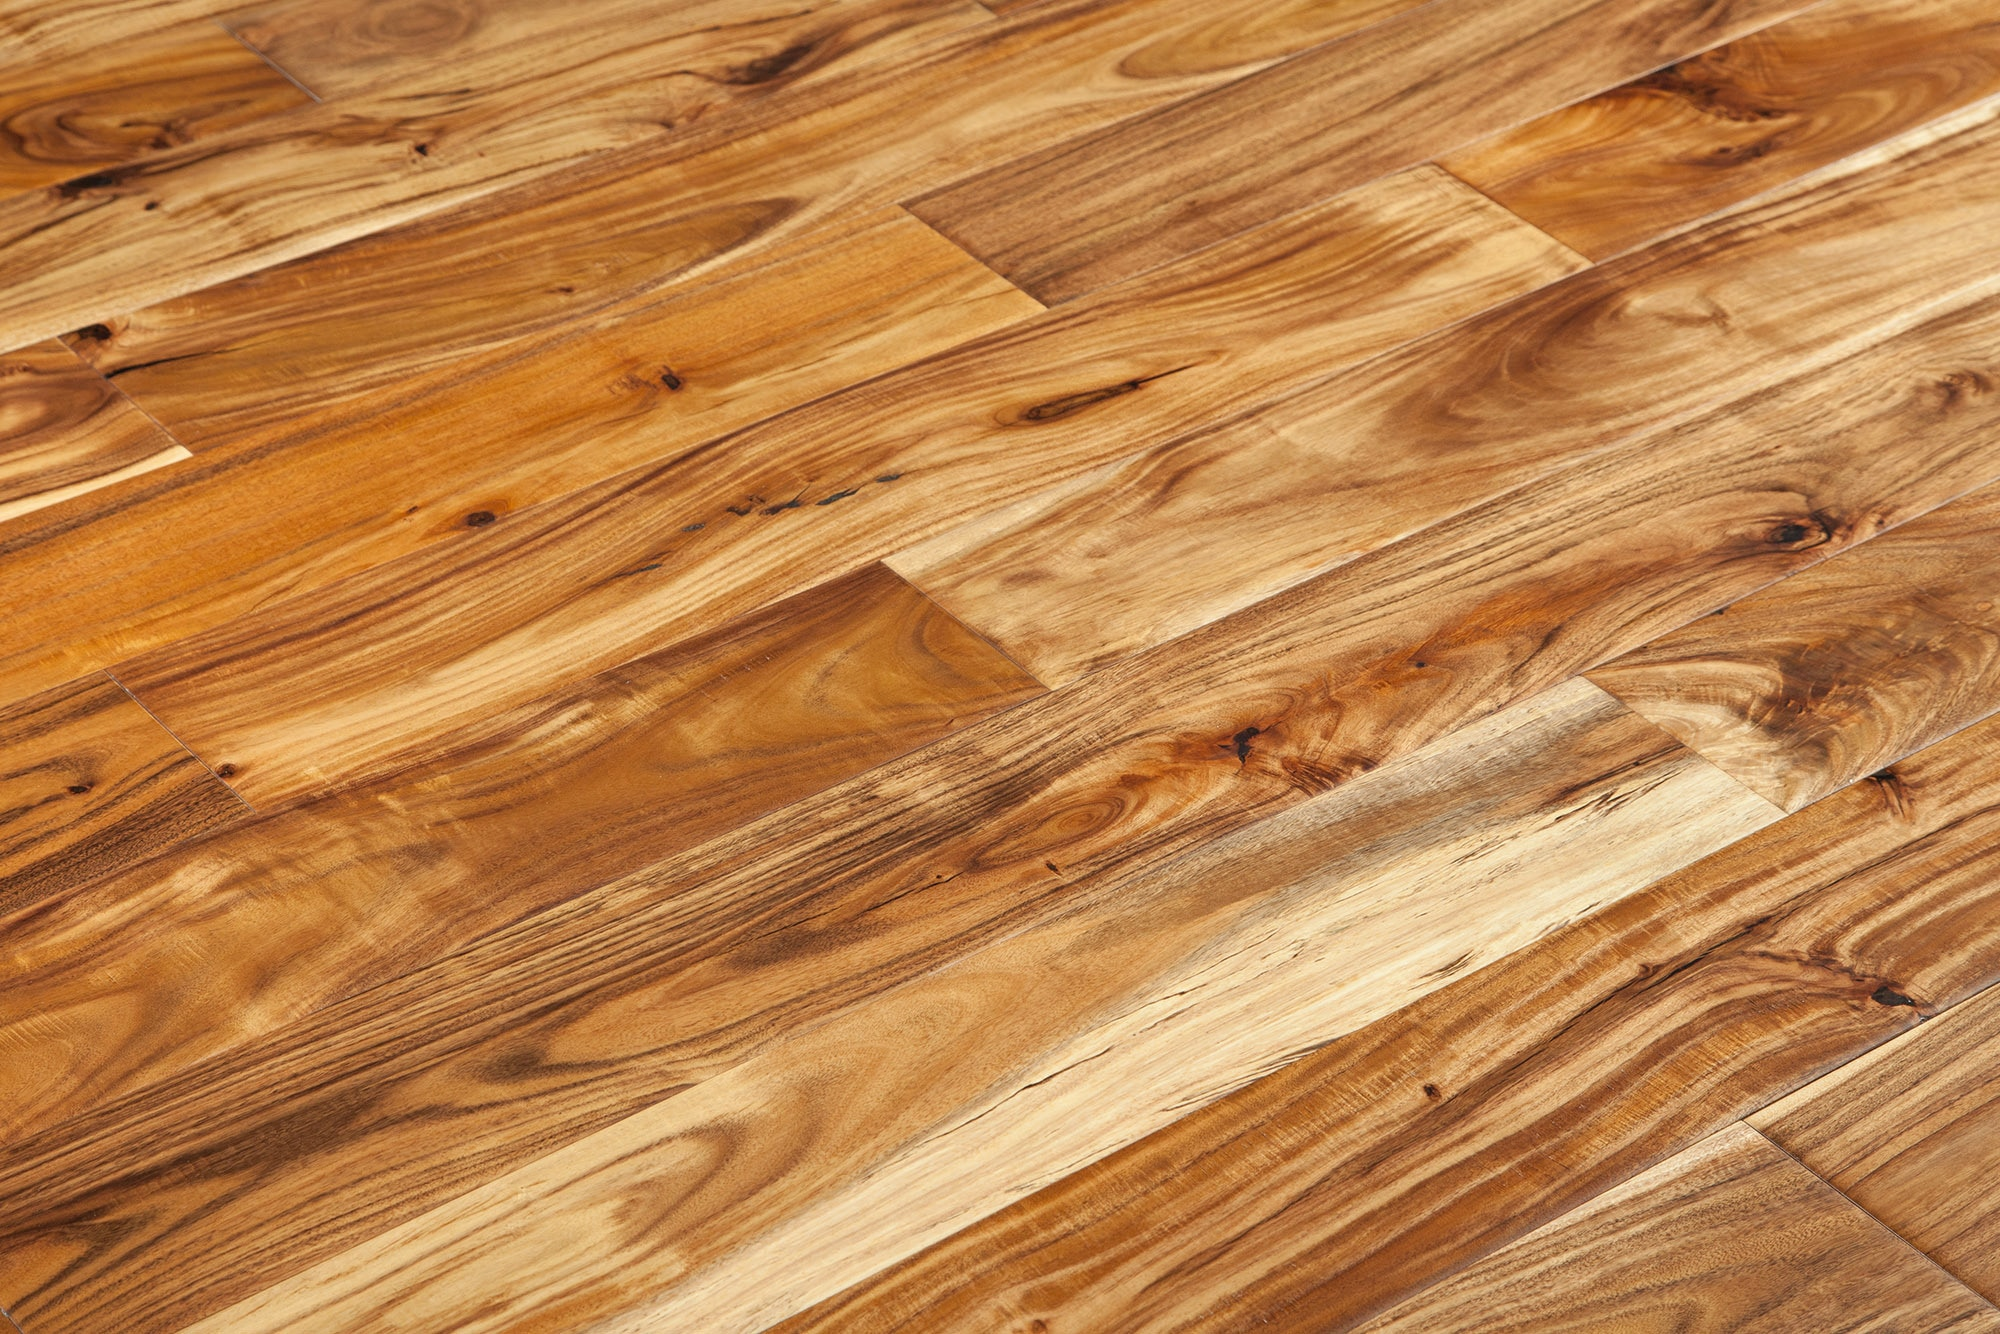 Mazama Hardwood Flooring Exotic Acacia Collection Handscraped